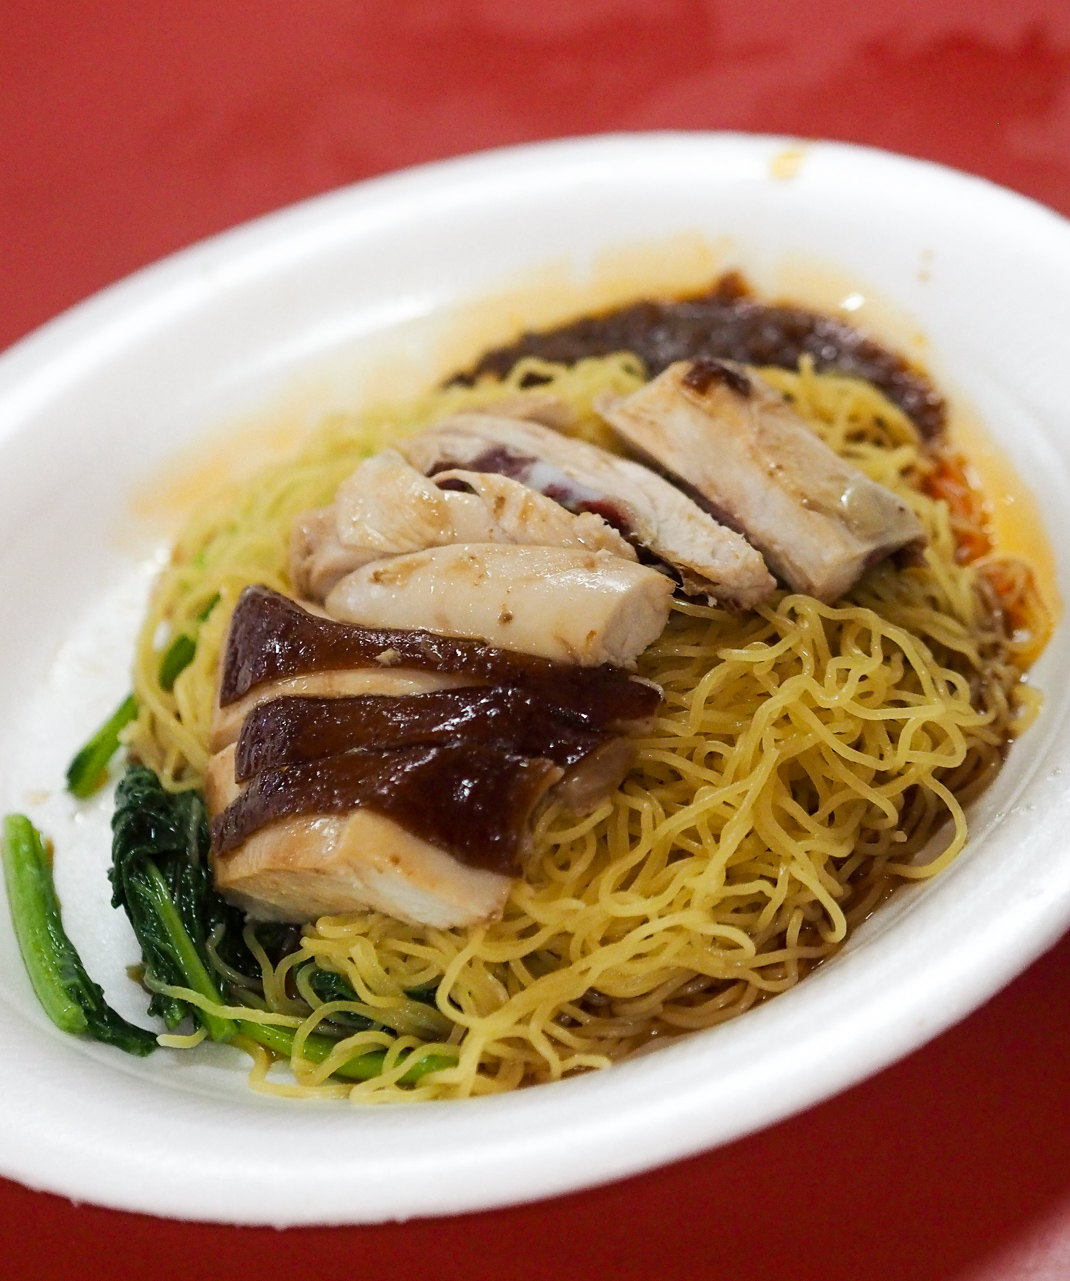 hong kong soya sauce chicken rice and noodles